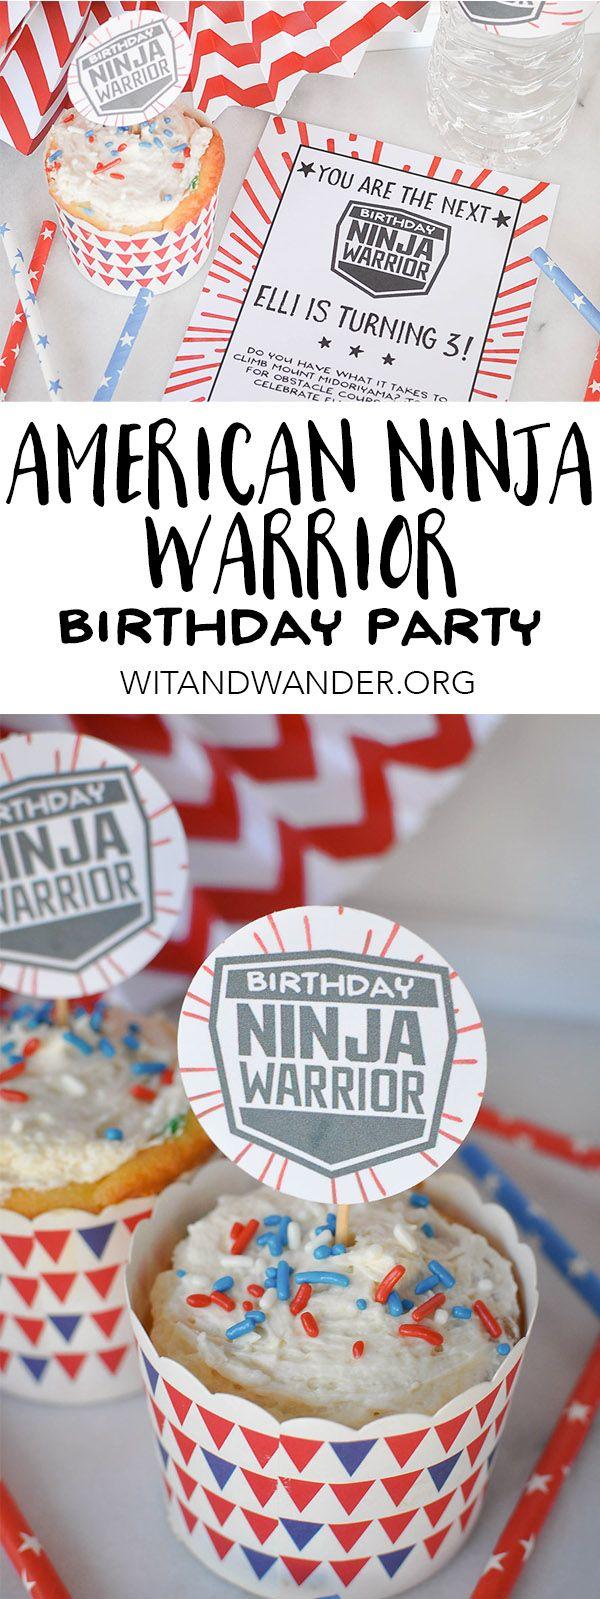 American Ninja Warrior Birthday Party   Wit & Wander   Kamps ninja ...